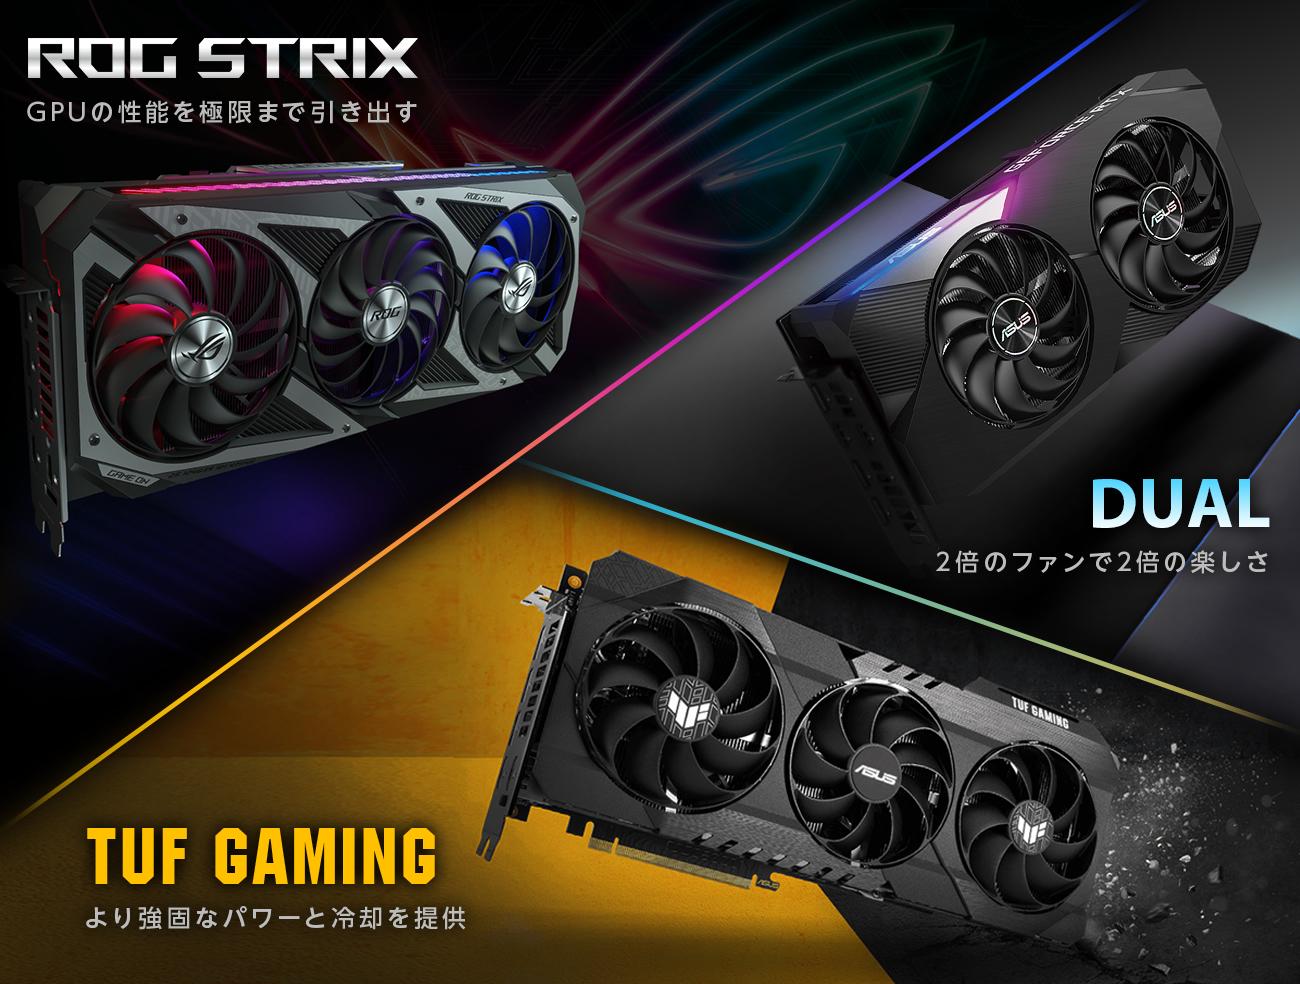 GPUの性能を極限まで引き出す/2倍のファンで2倍の楽しさ/より強固なパワーと冷却を提供